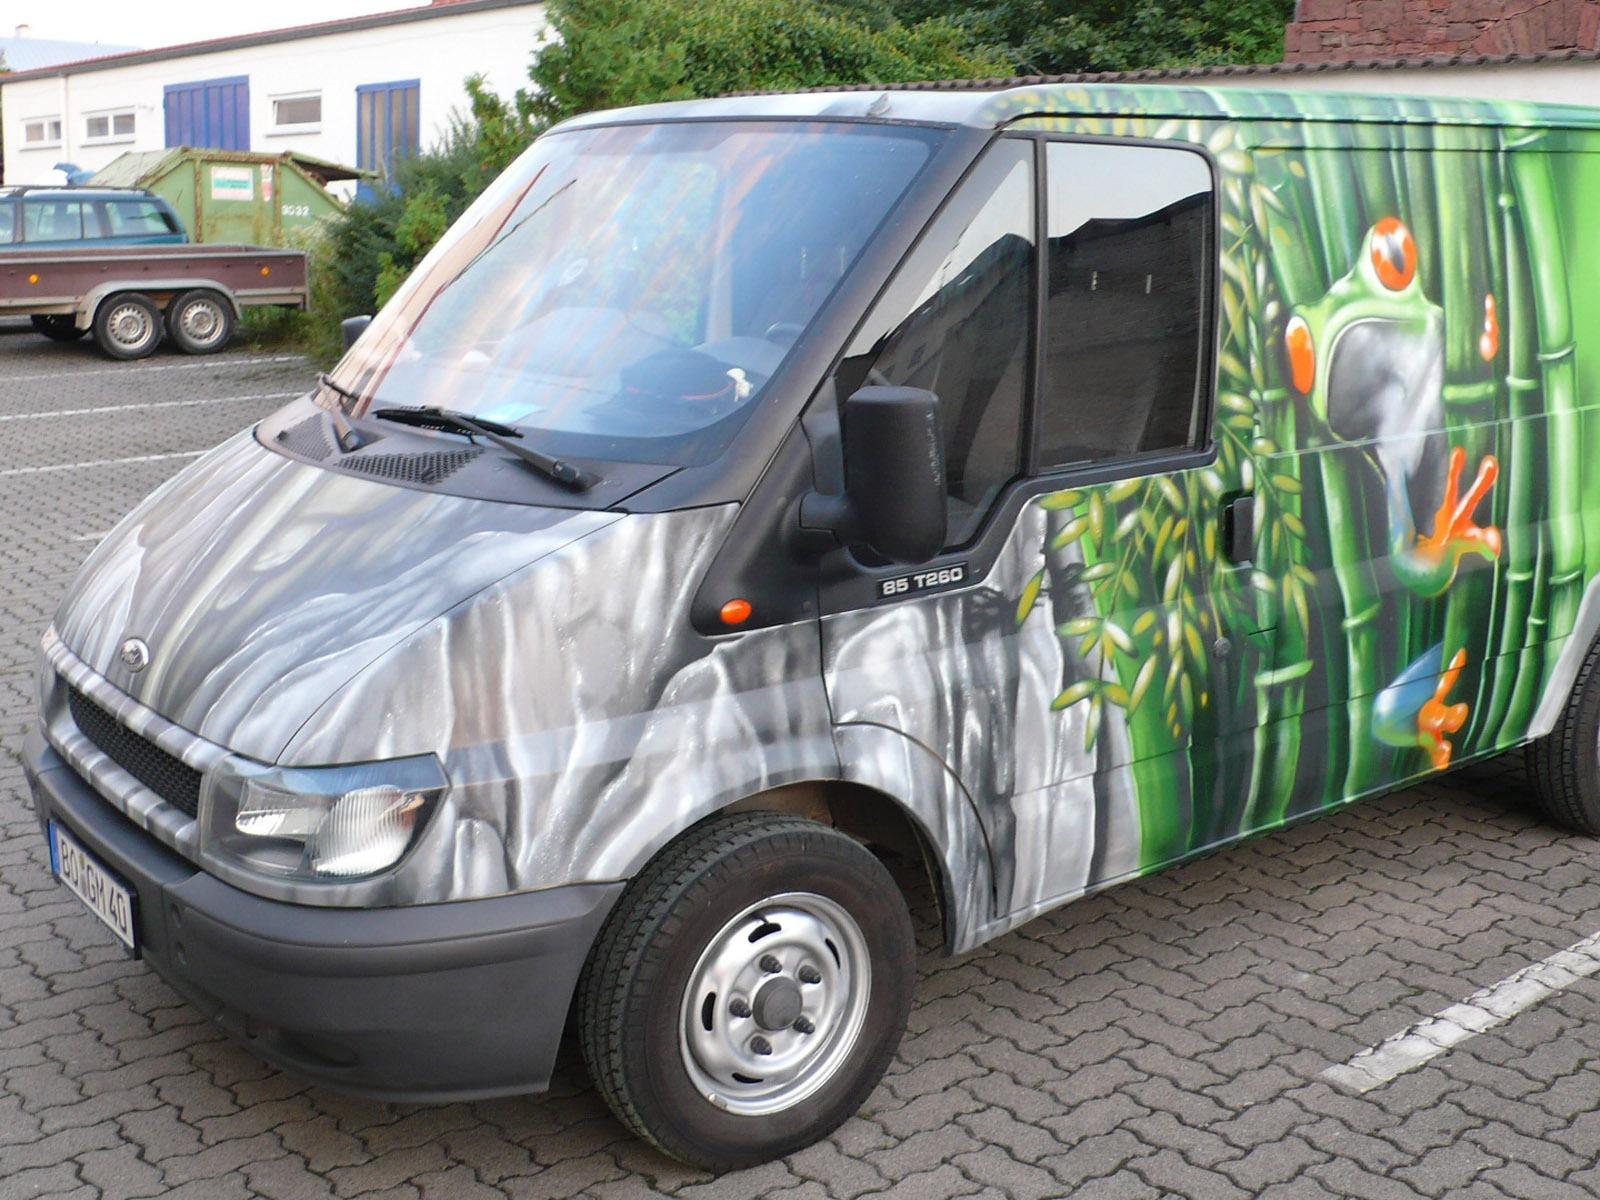 graffitiauftrag-graffitikuenstler-artmos4-goranmobil-auto-2008-tier-frosch-pflanzen-landschaft-mauer-objekt-gruen-grau-fotorealistisch-fahrzeug